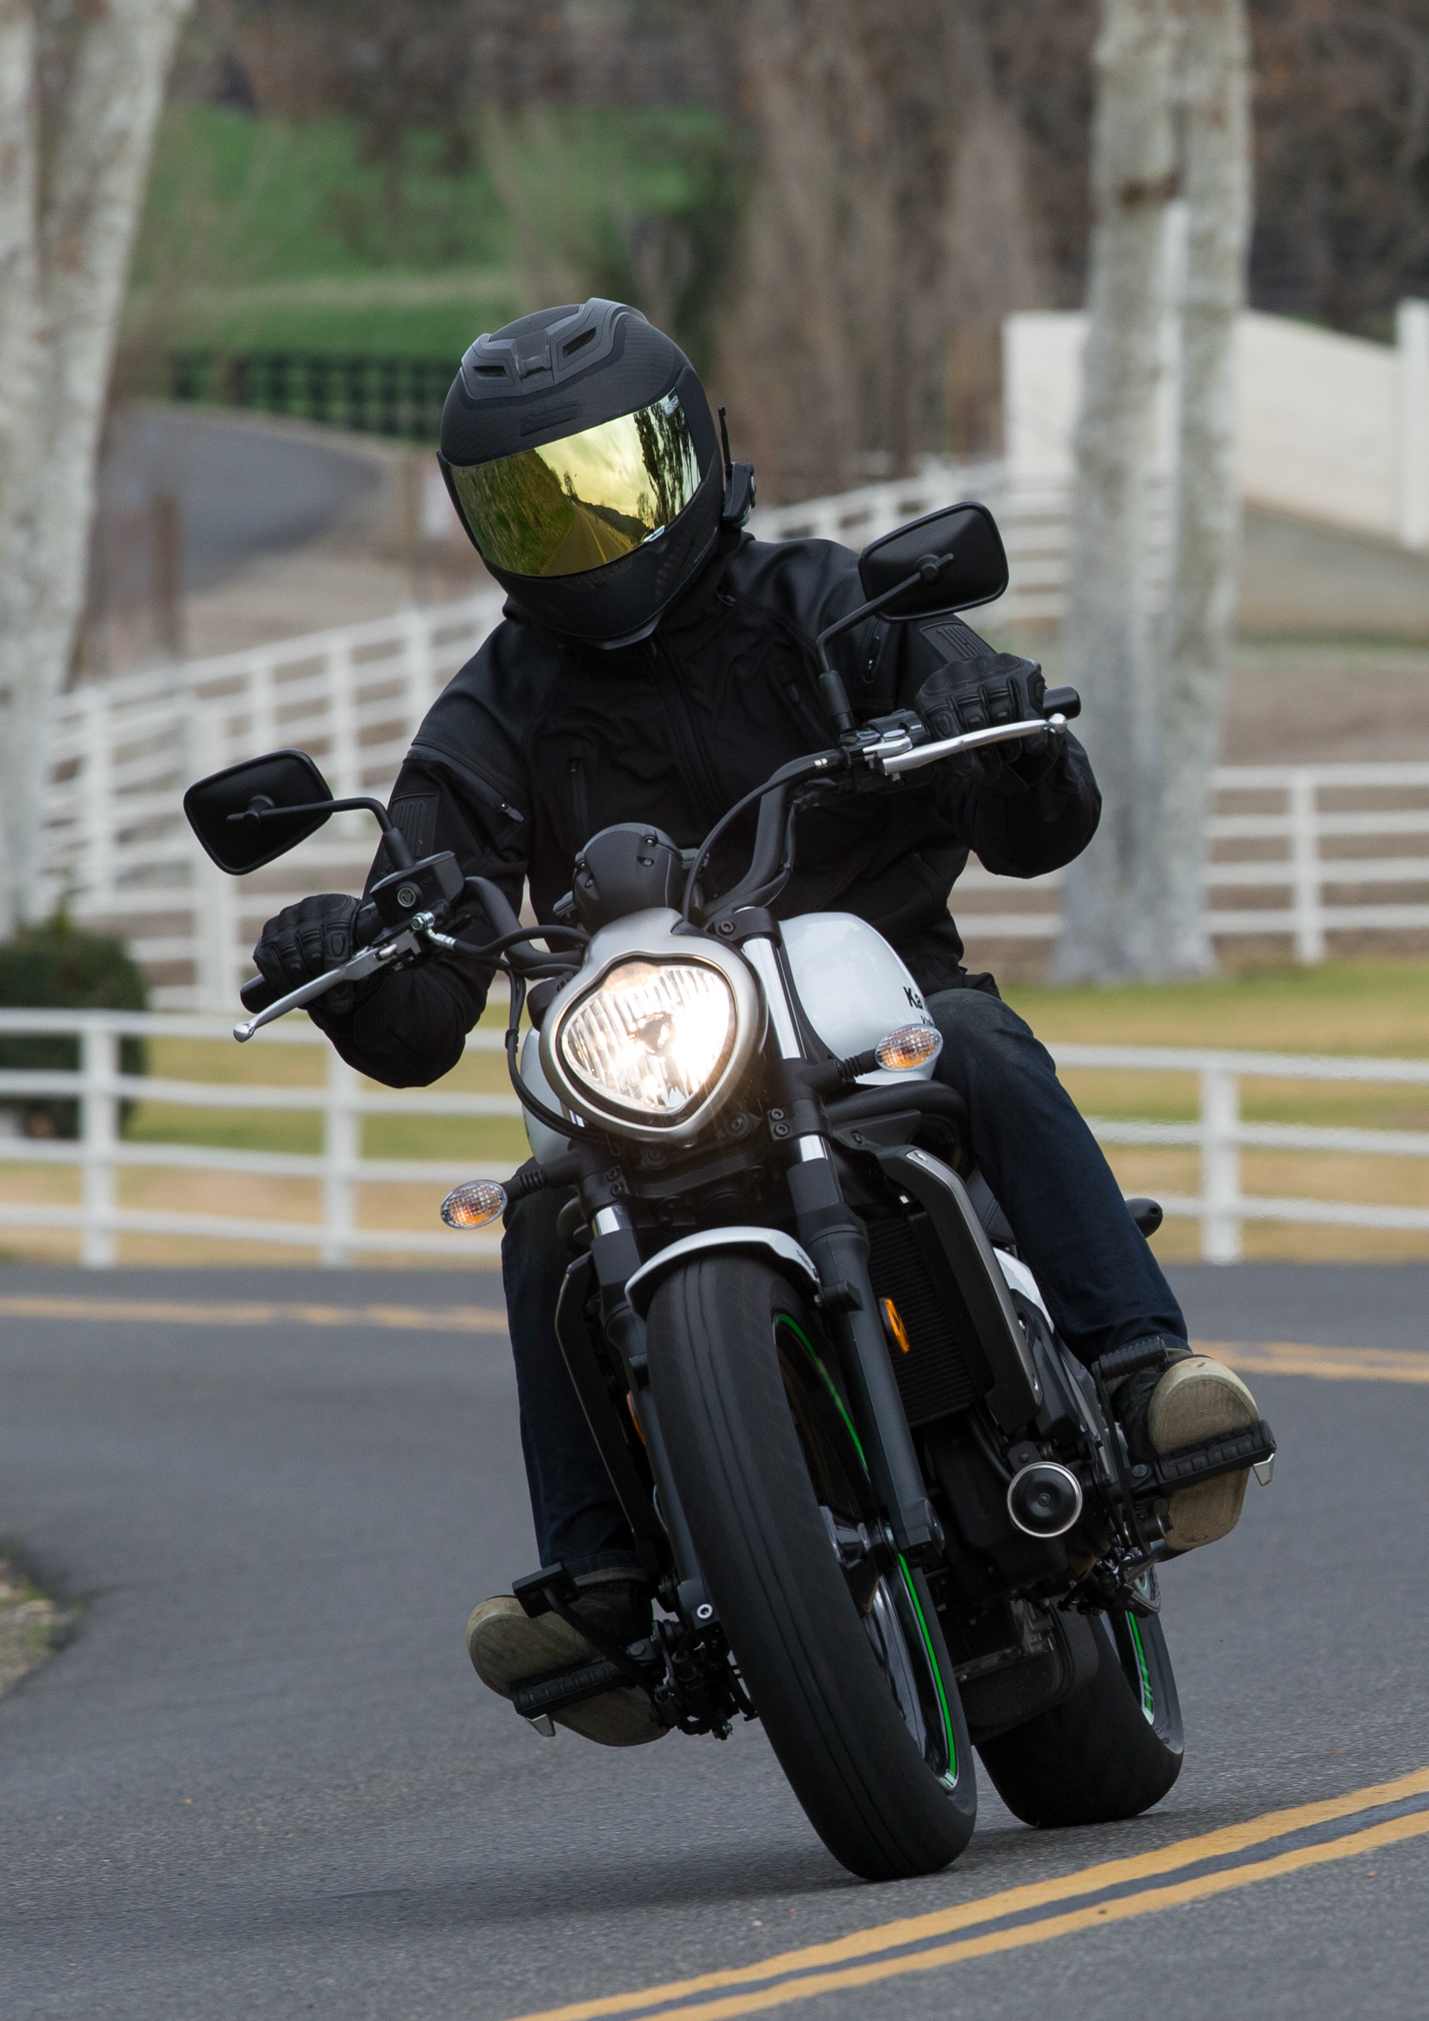 2015 Kawasaki Vulcan S Abs First Ride Revzilla